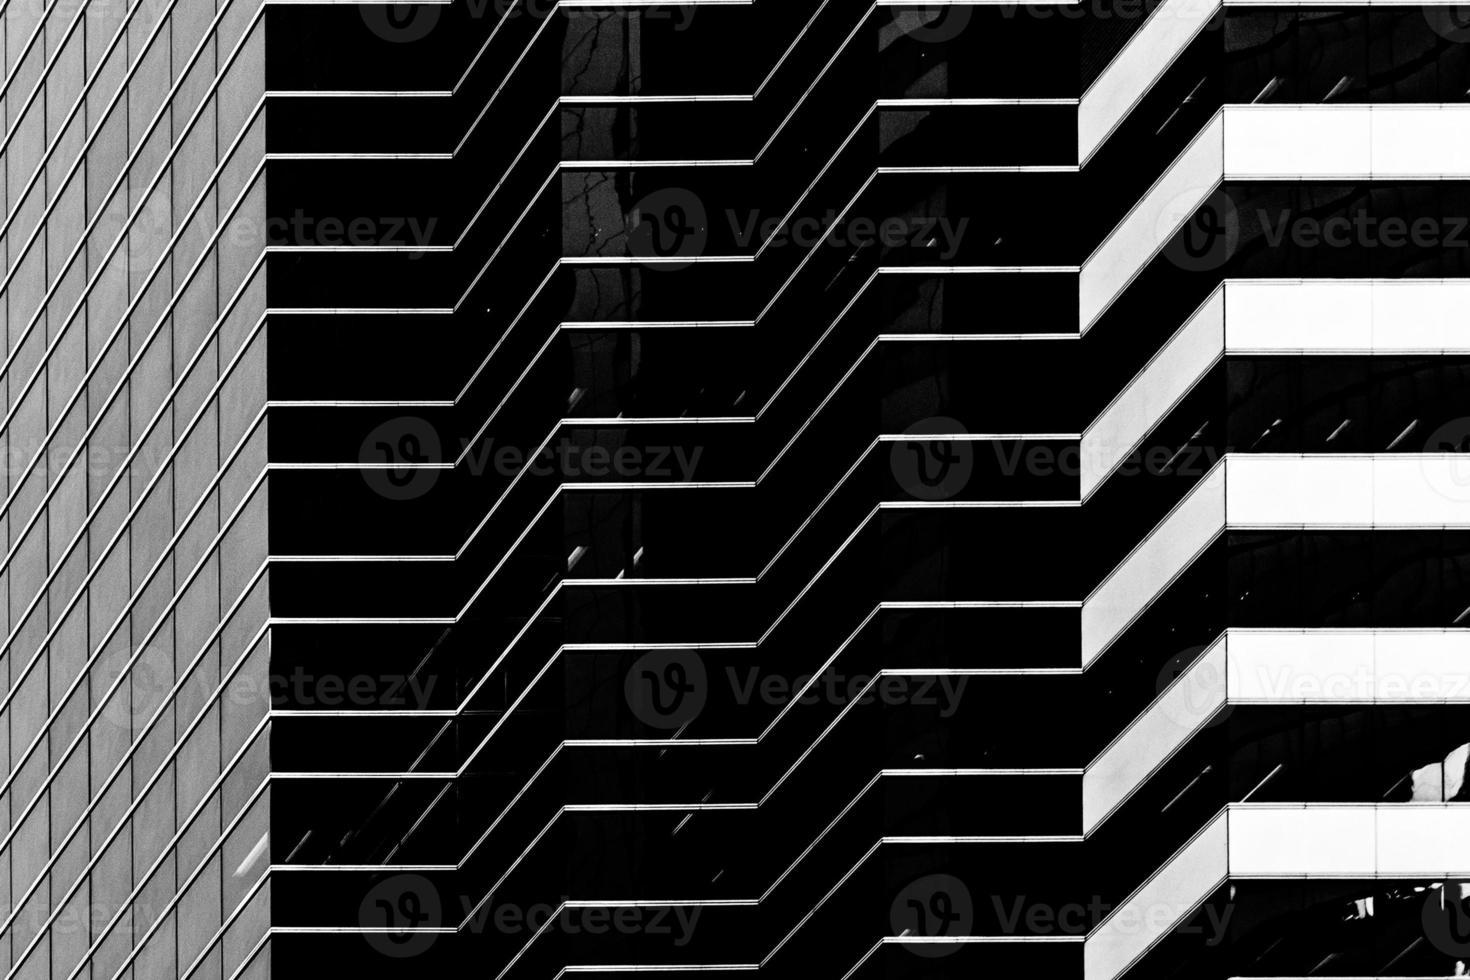 arquitecturas comerciales modernas b & w foto